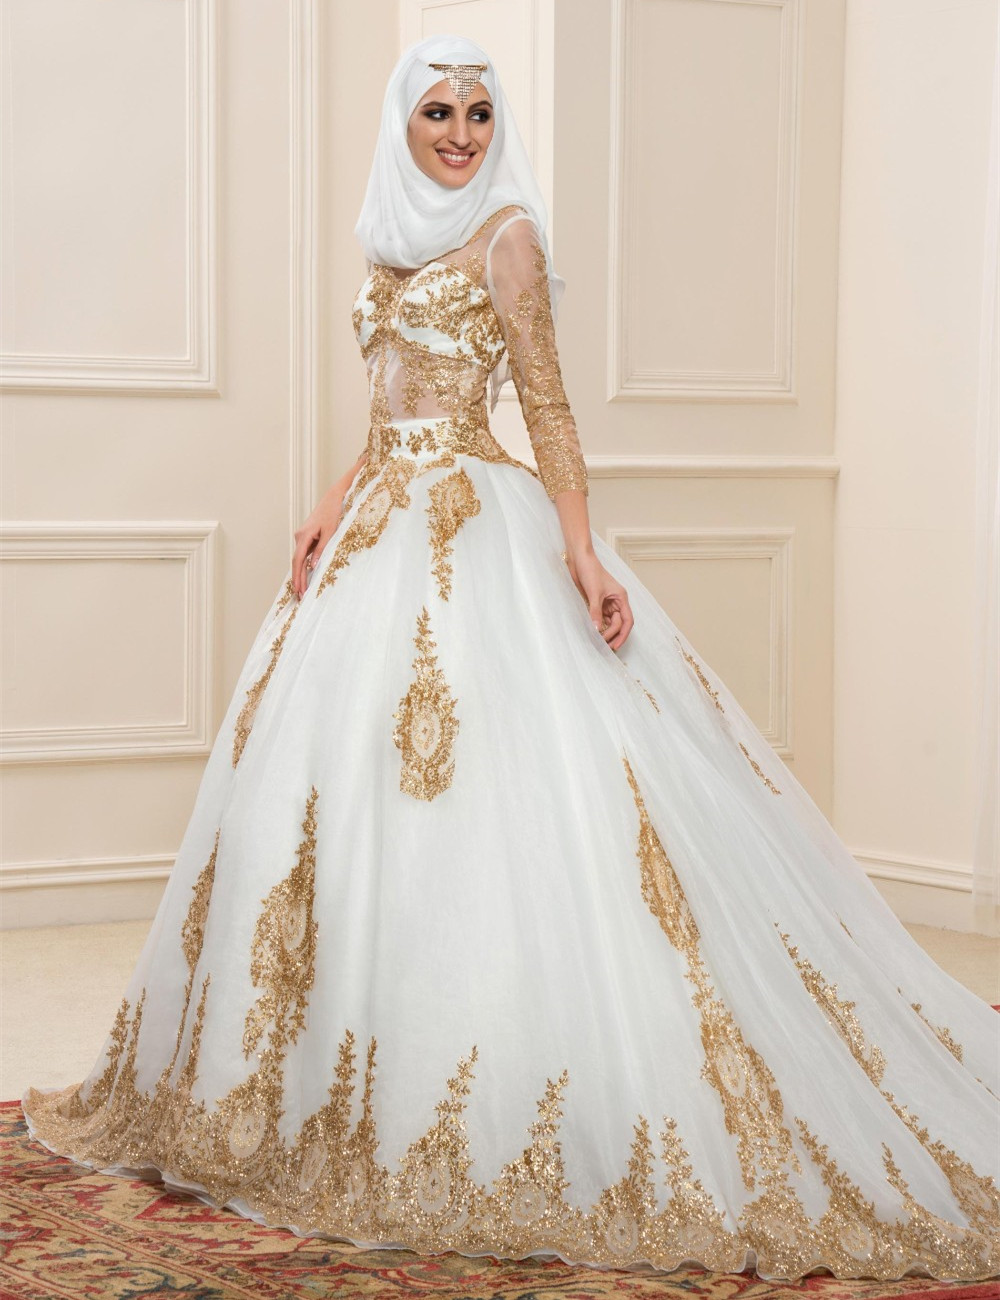 Us 188 0 Gold Lace Long Sleeve Muslim Wedding Dresses 2016 See Through Ball Gown Dubai Hijab Wedding Dress Bride Bridal Gowns In Wedding Dresses